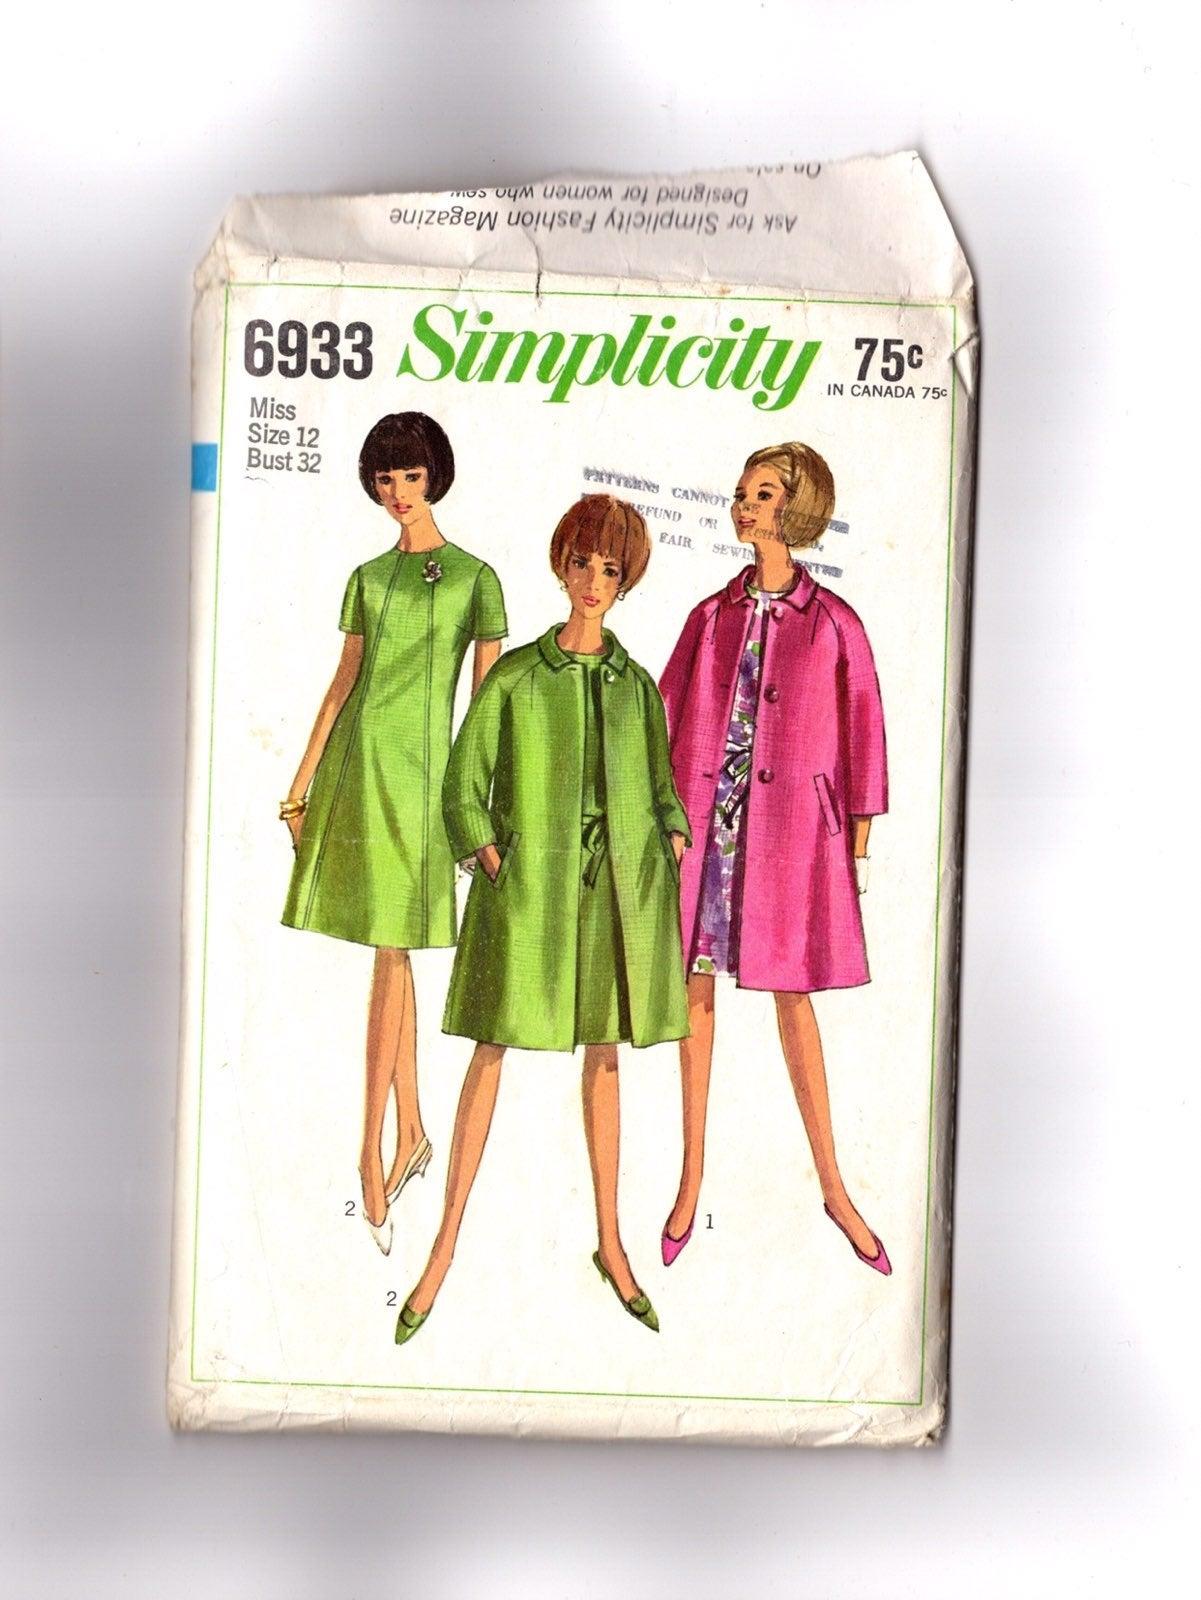 Vintage Pattern 1960s Dress & Coat